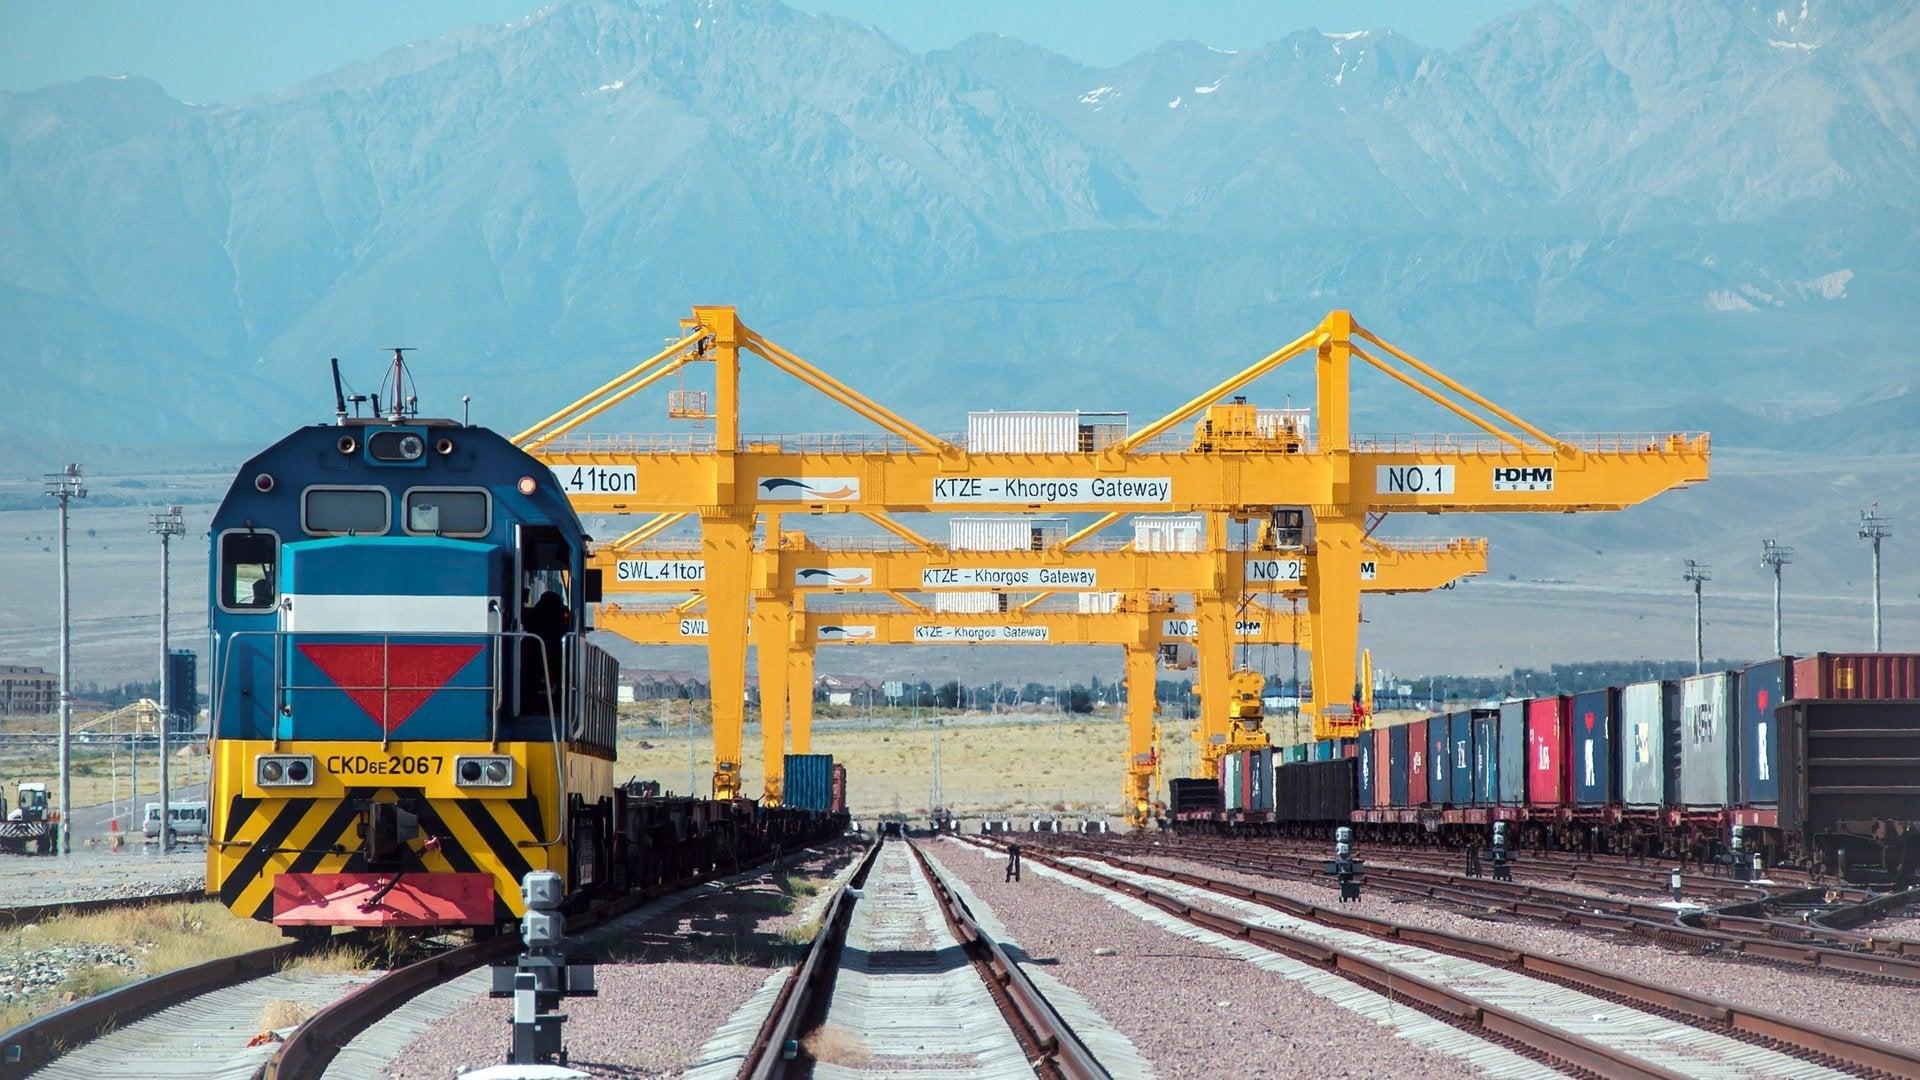 Khorgos Gateway: Where East Meets West